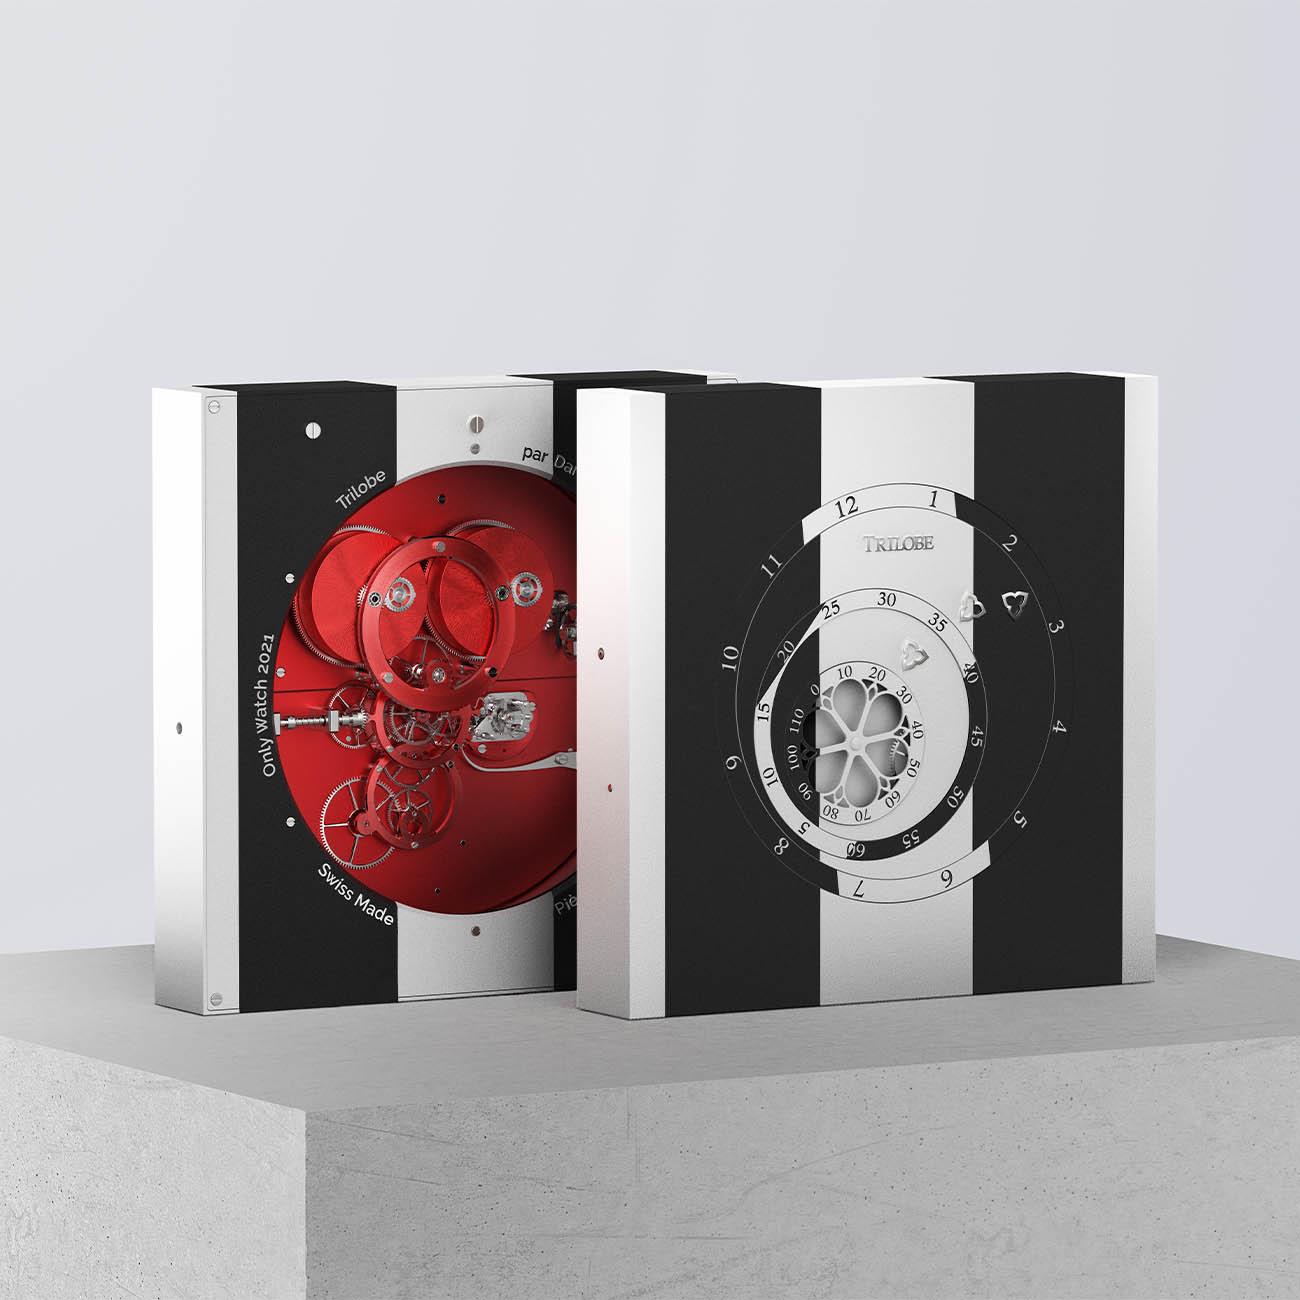 Trilobe x Daniel Buren Only Watch 2021